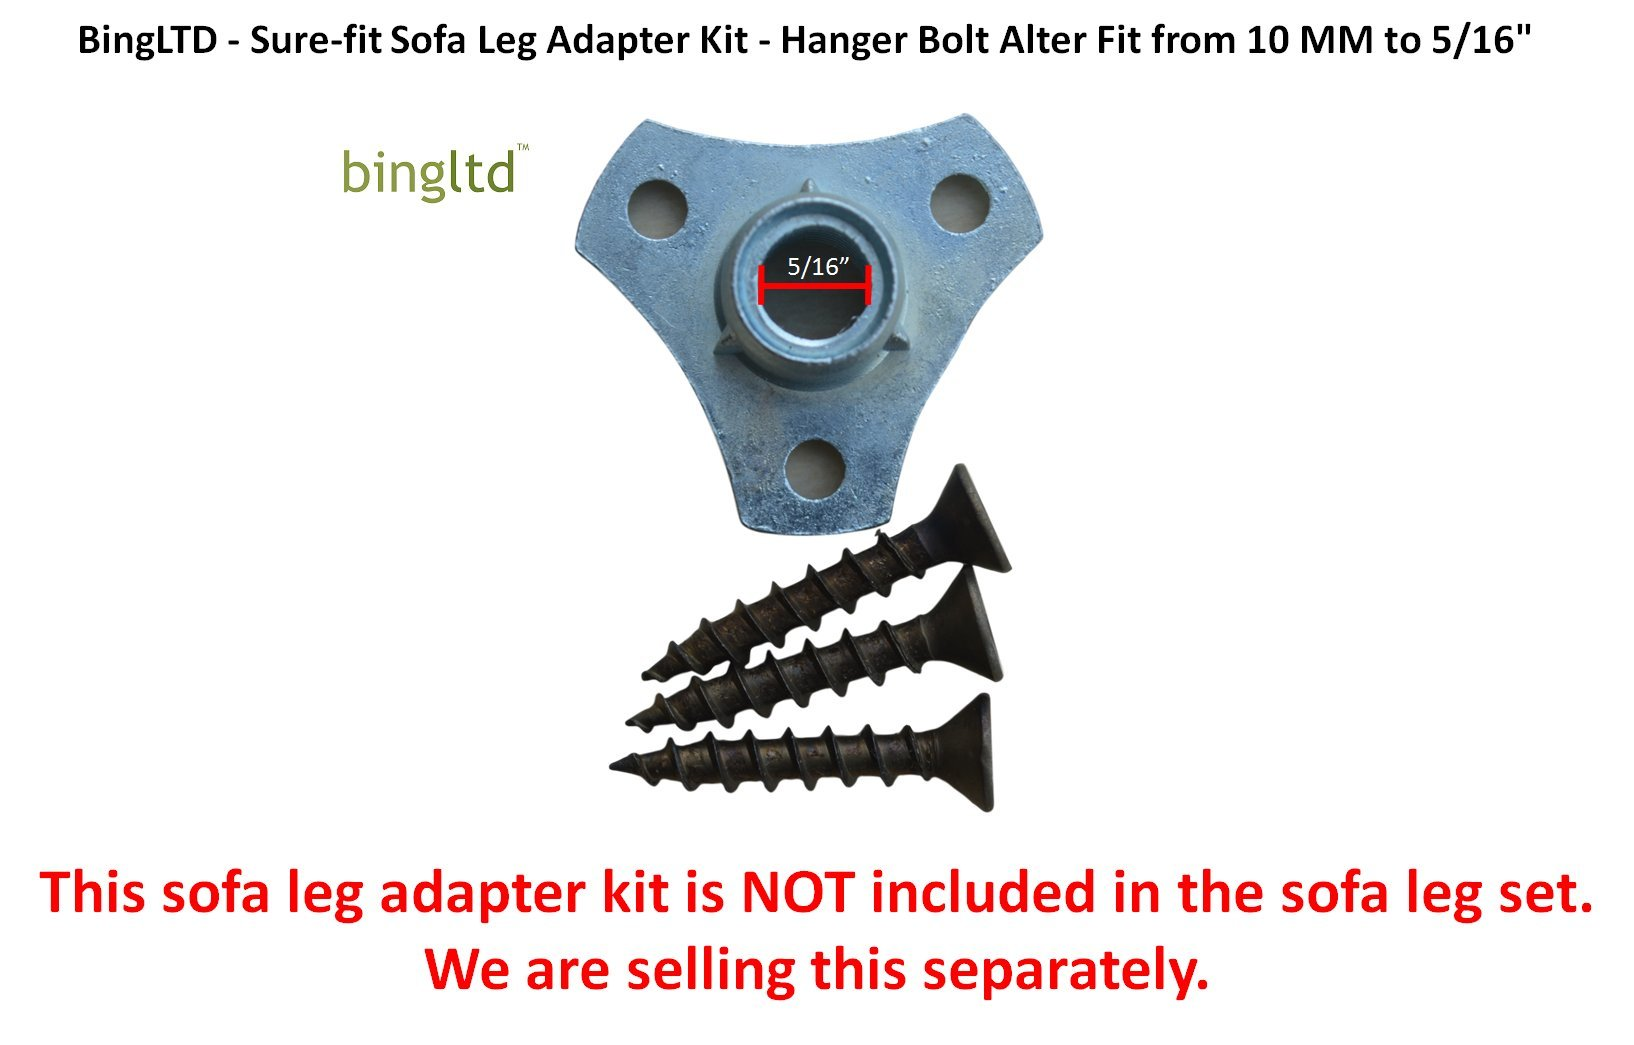 Bingltd'' - ST47-AW Antique White SET of 4 - Hardwood Square Tapered Legs by BingLTD (Image #3)